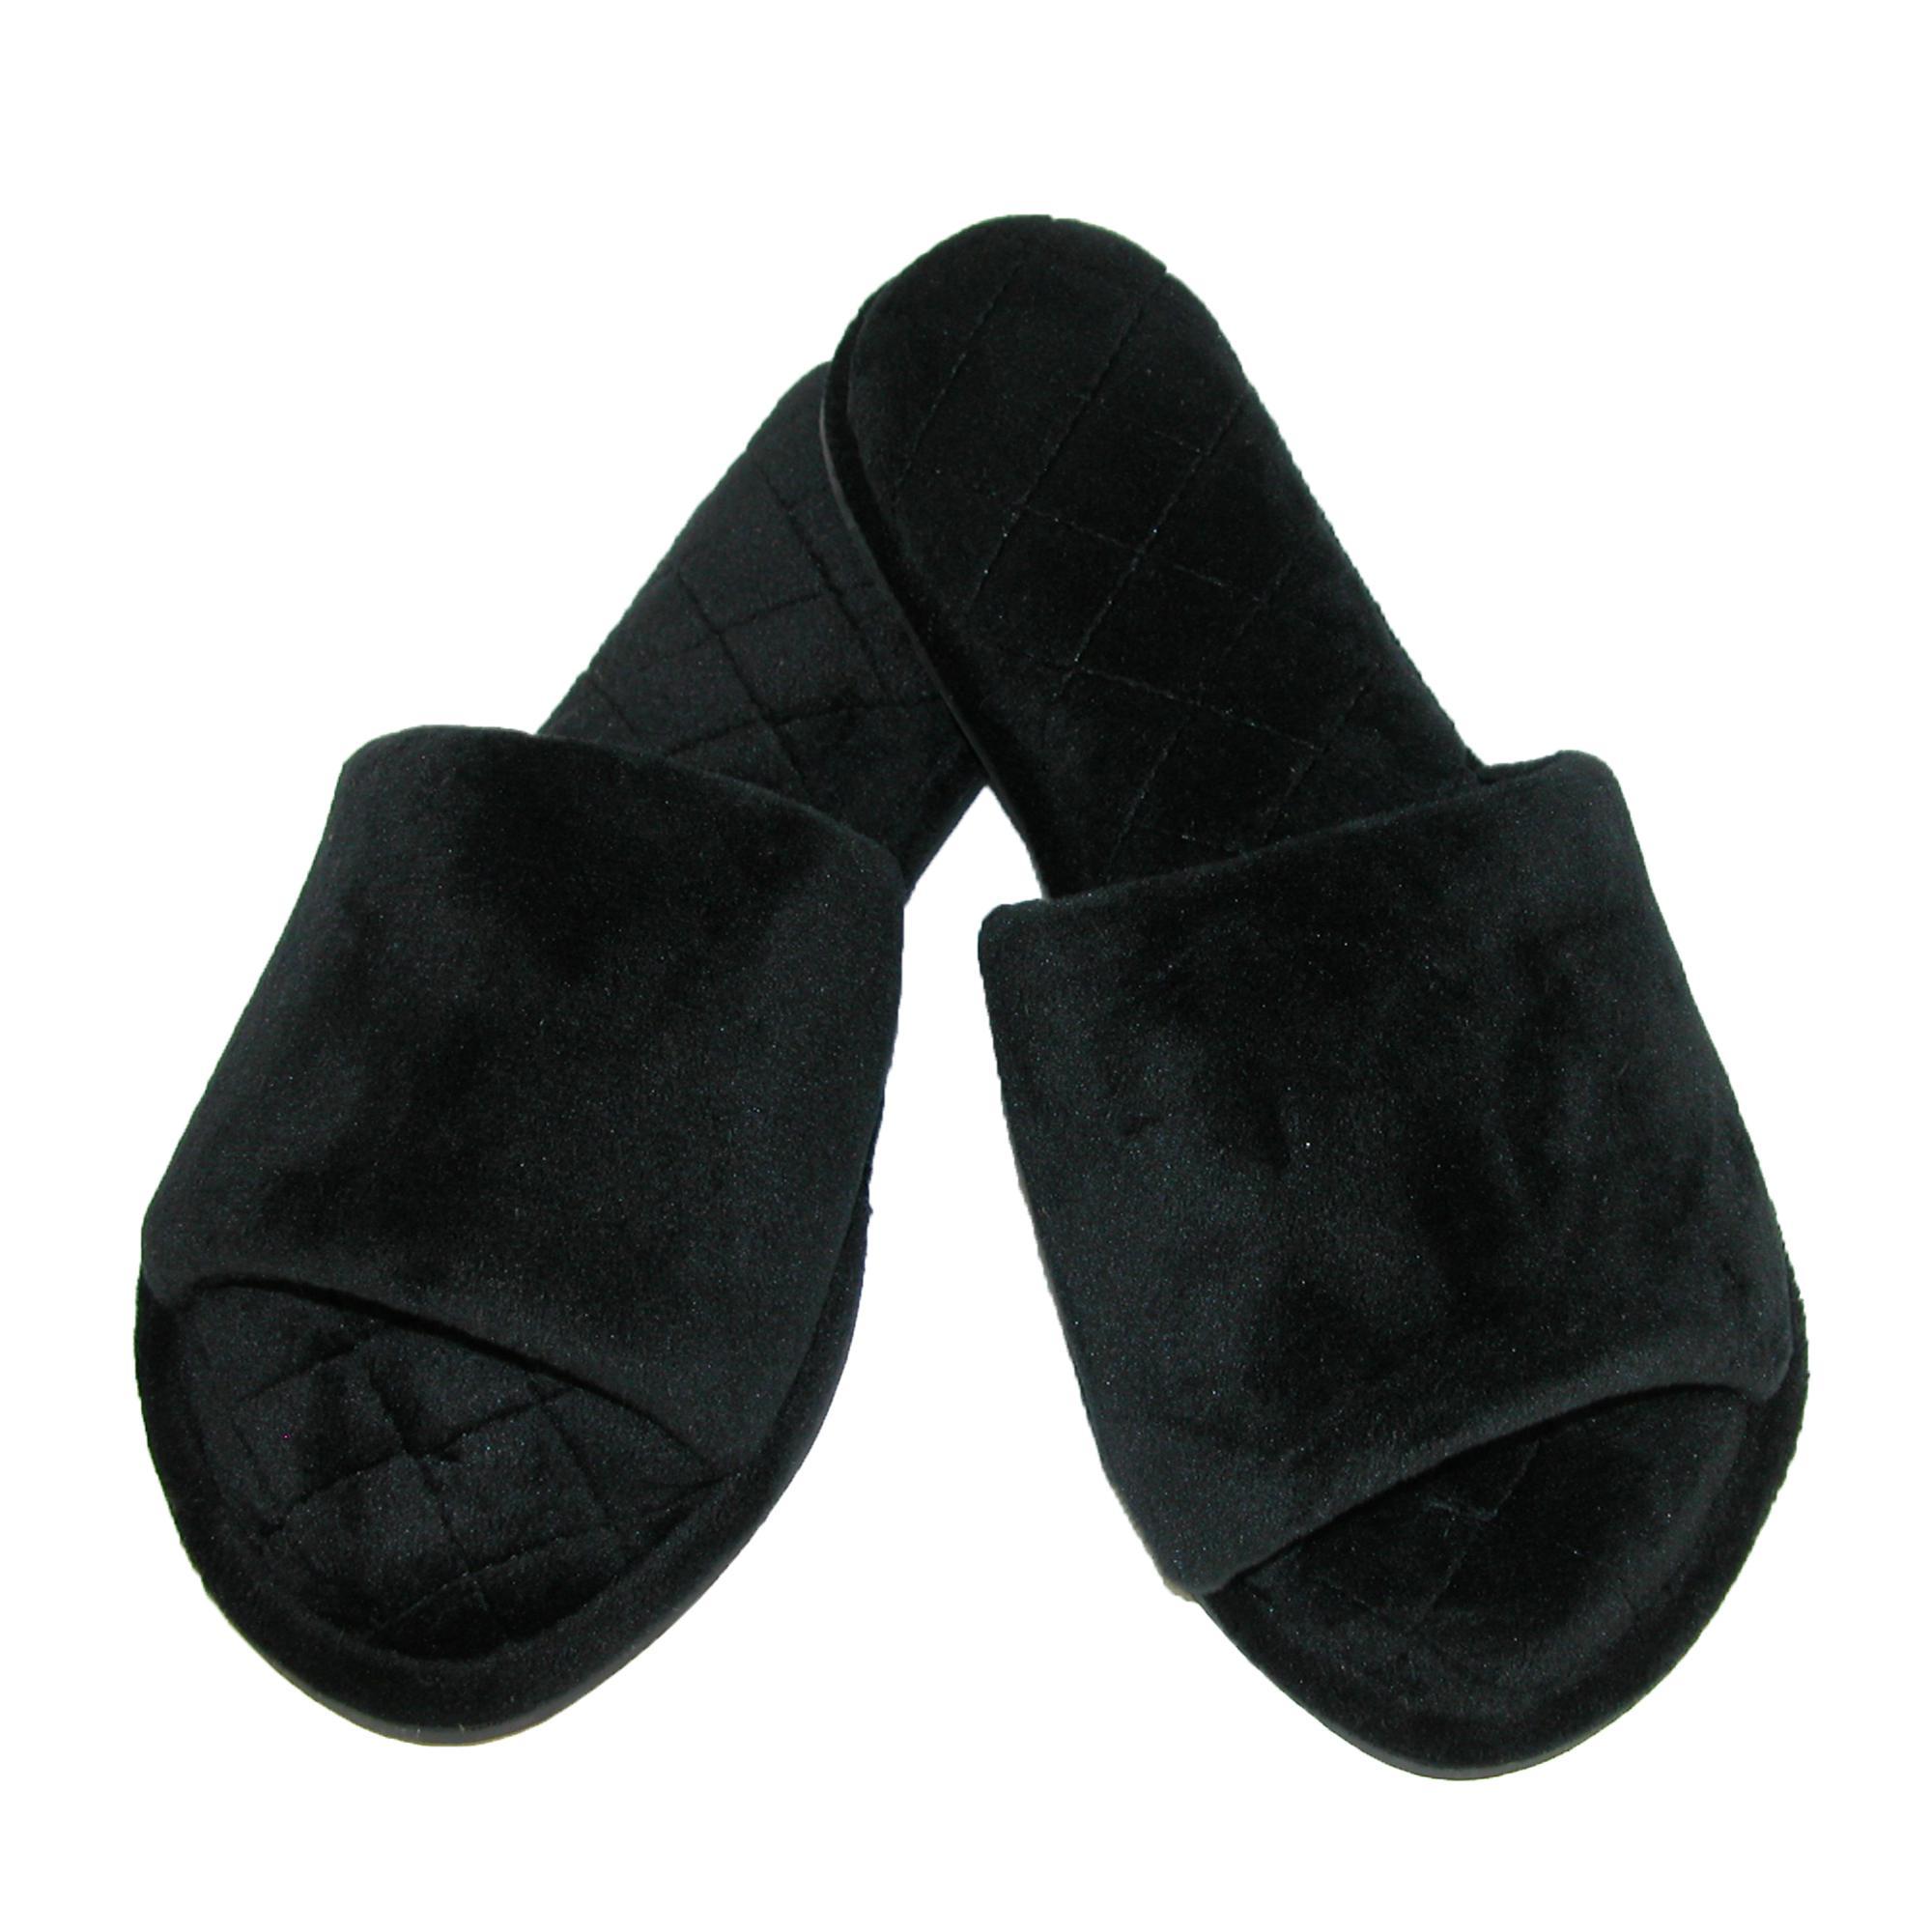 New Dearfoams Women/'s Velour Side Gore Slide Slipper with Microfiber